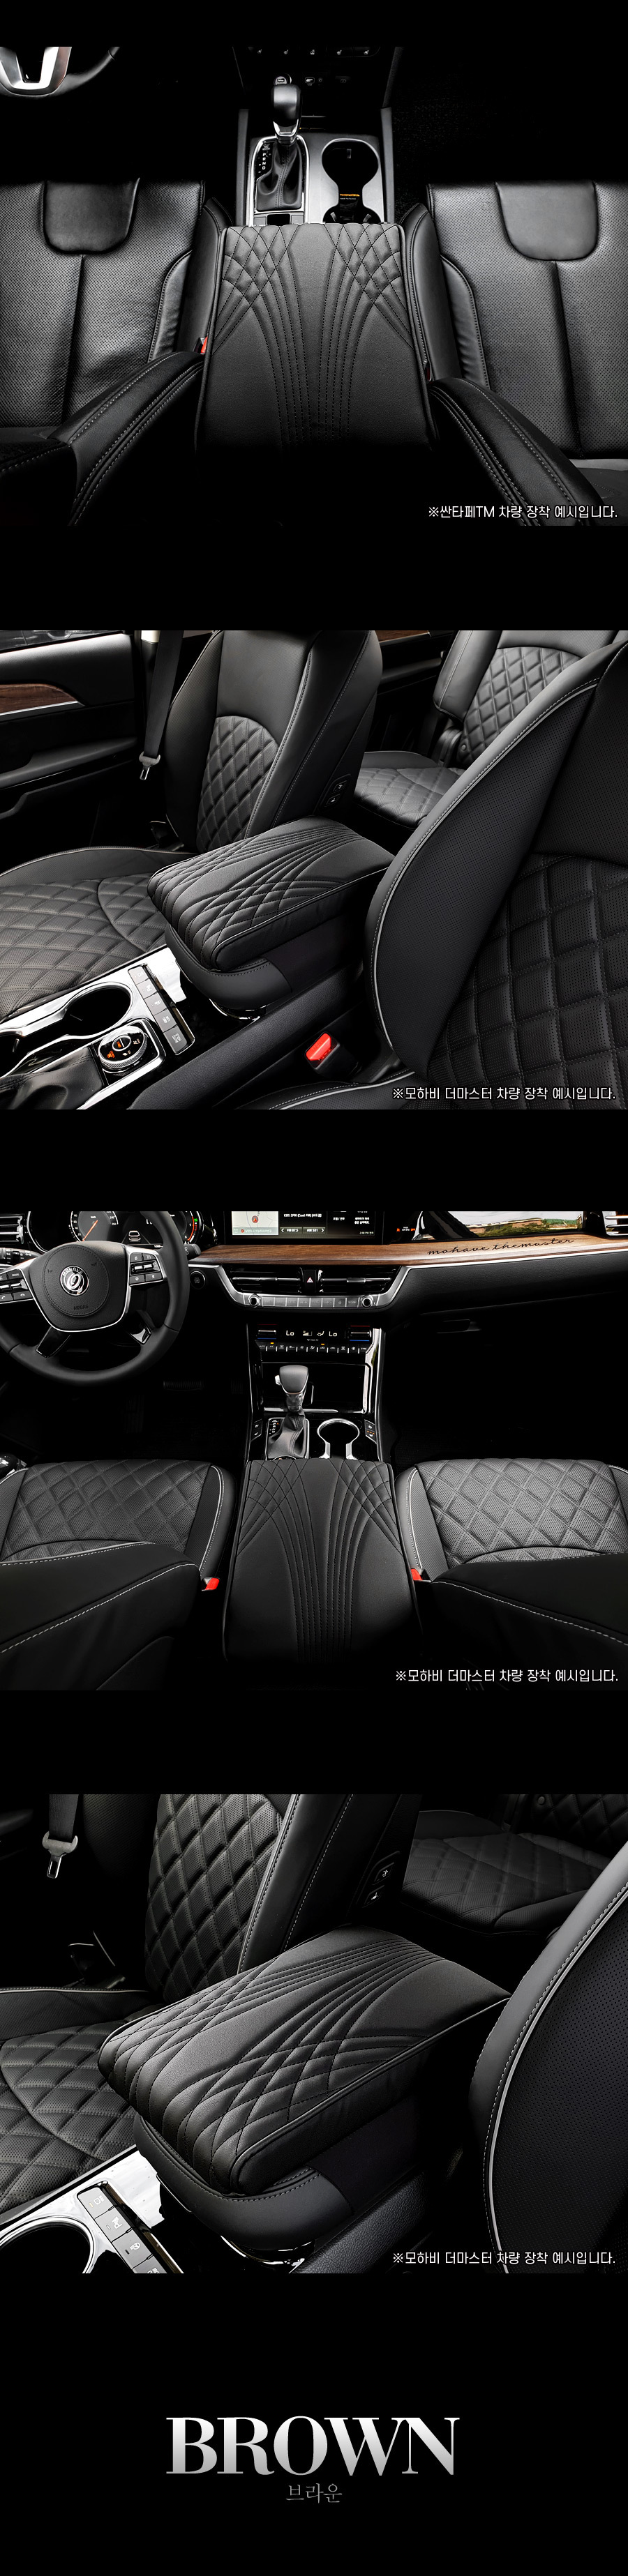 leather-flare-console-cushion_05.jpg